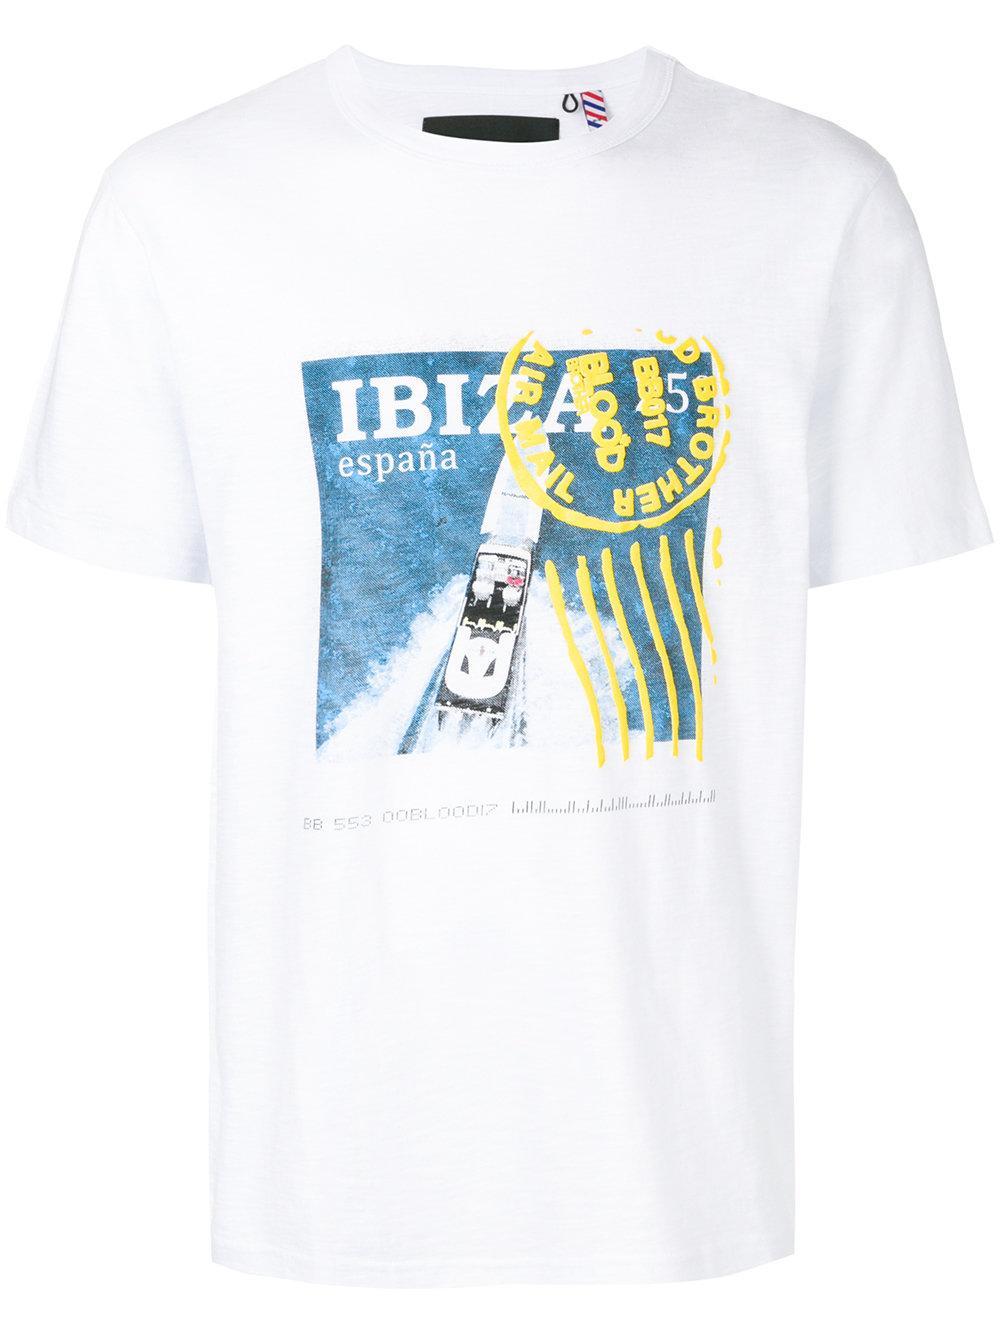 Blood Brother Ibiza T-Shirt